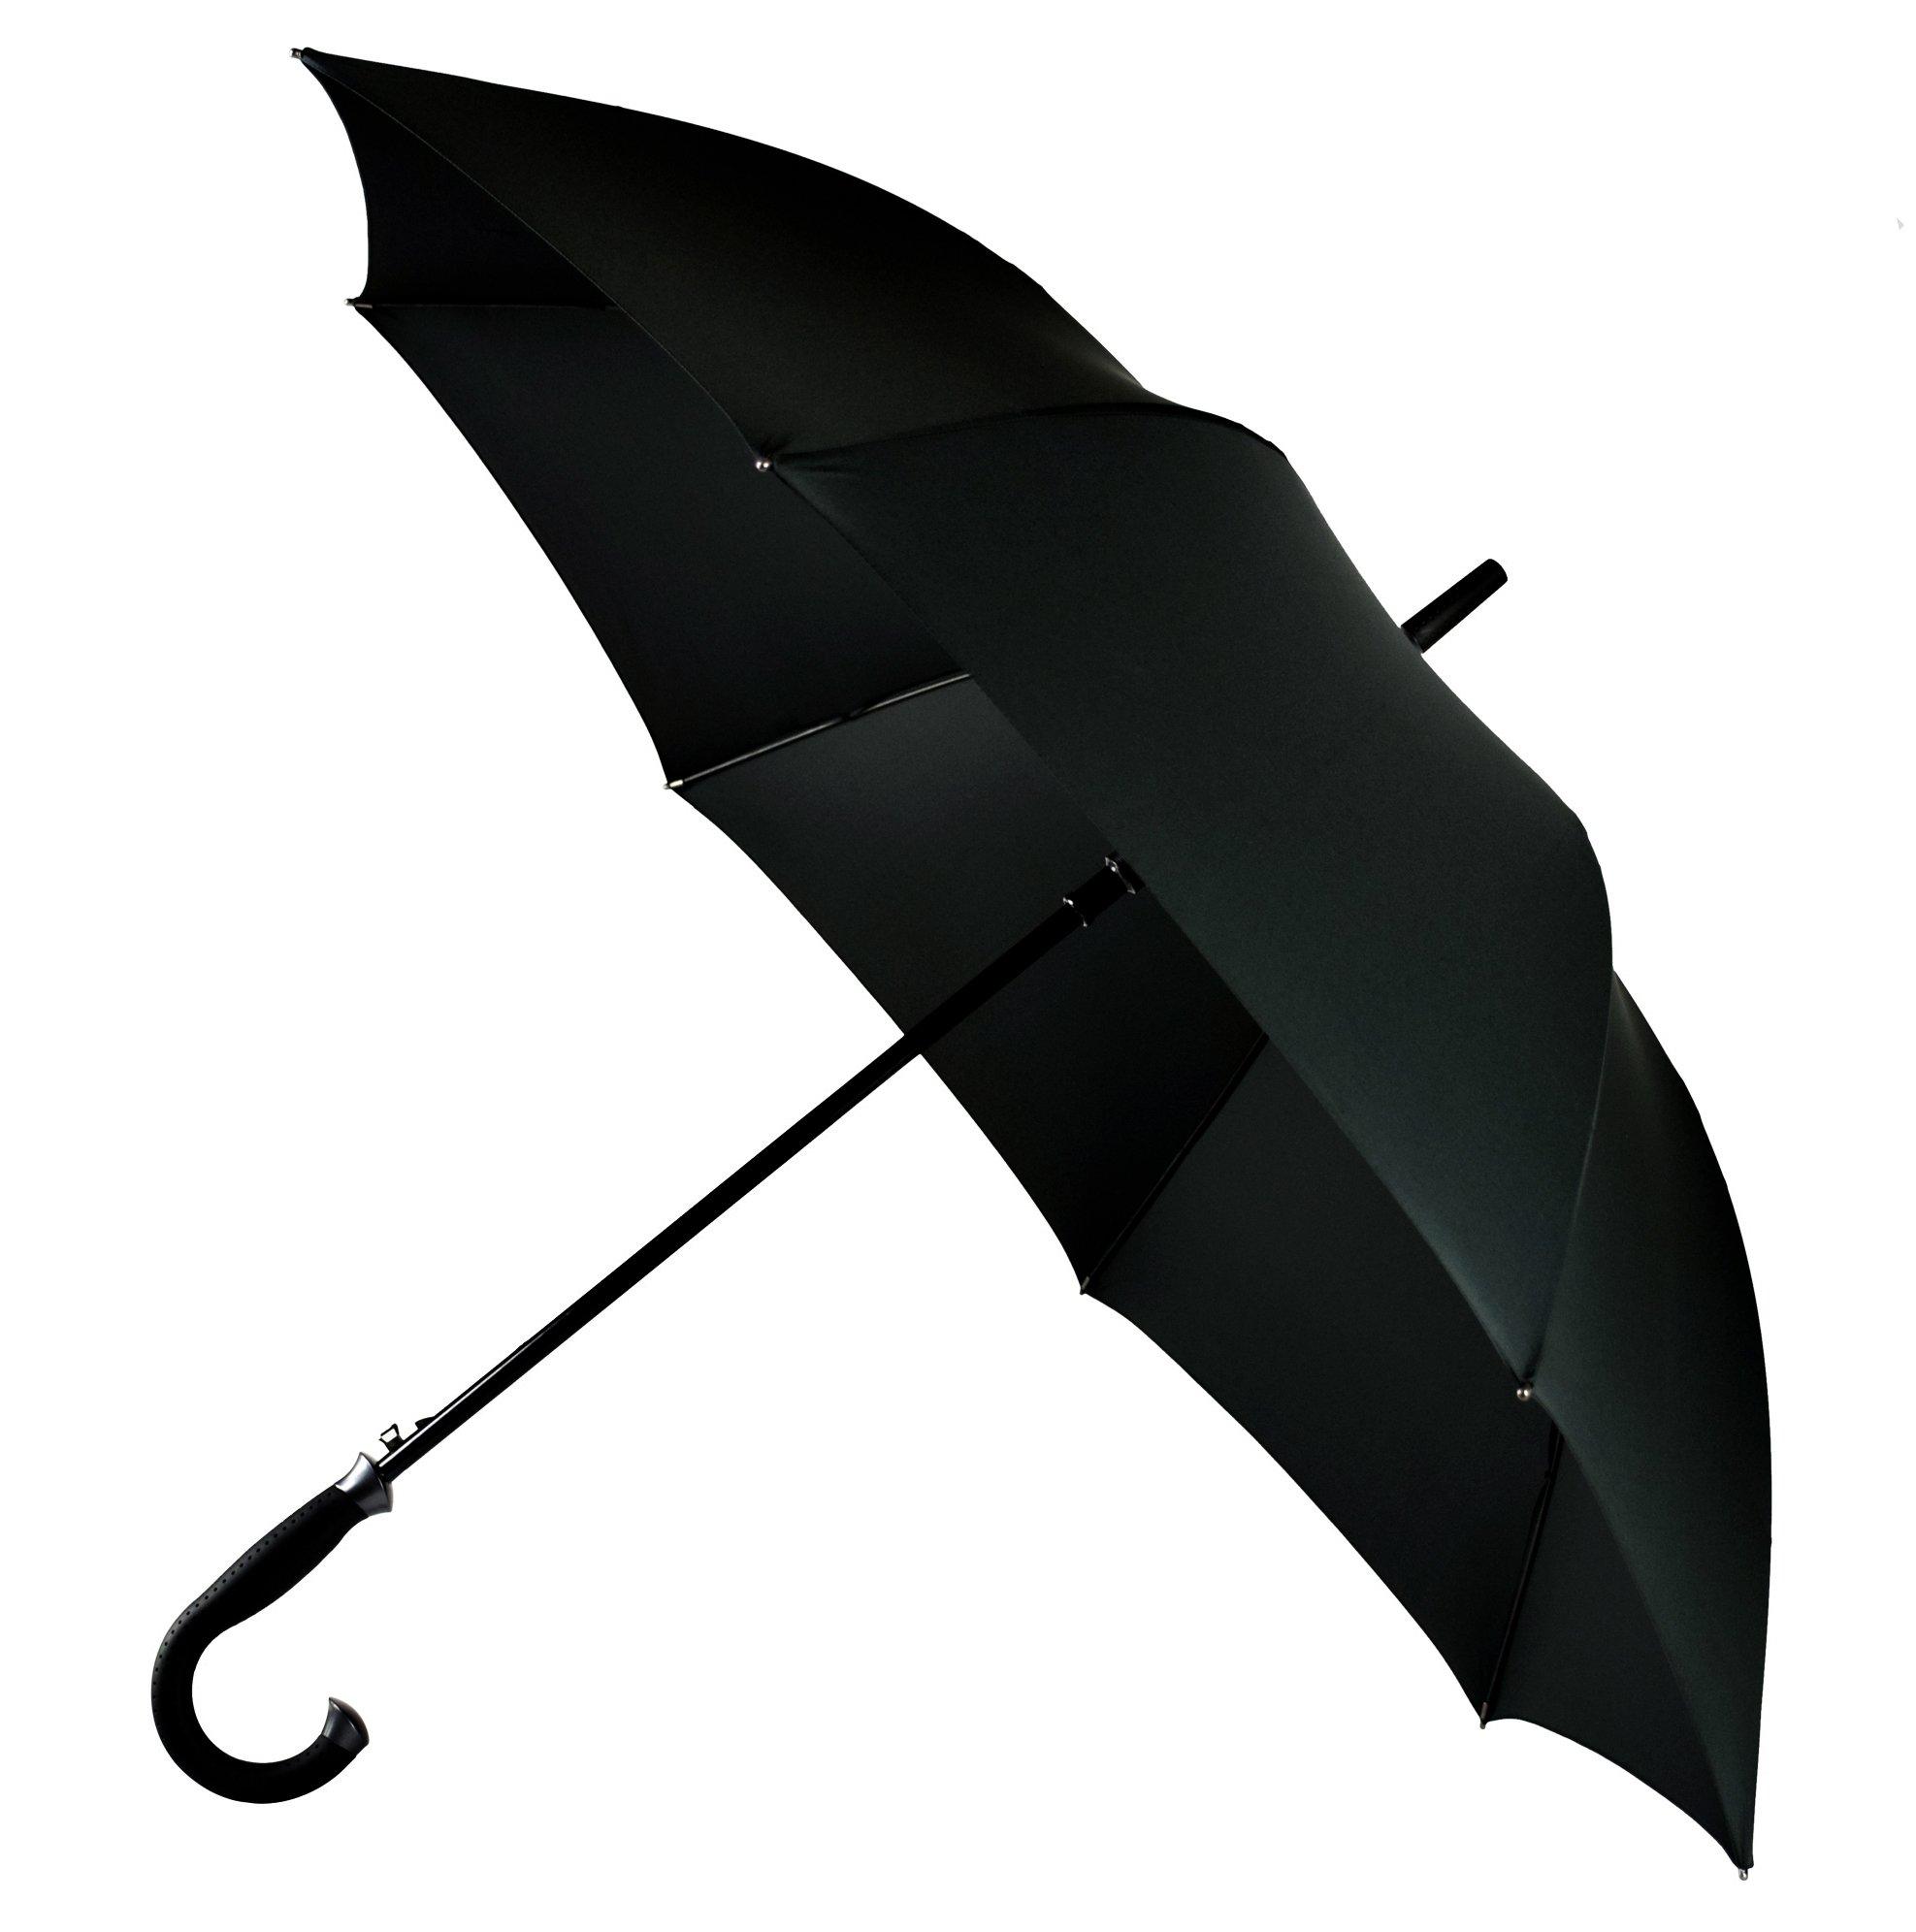 LifeTek Kingston 54 Inch Cane Umbrella Automatic Open Extra Large Full Size Windproof Frame 210T Microfiber Fabric with Teflon Rain Repellant Protection Stick Umbrellas Black by LifeTek